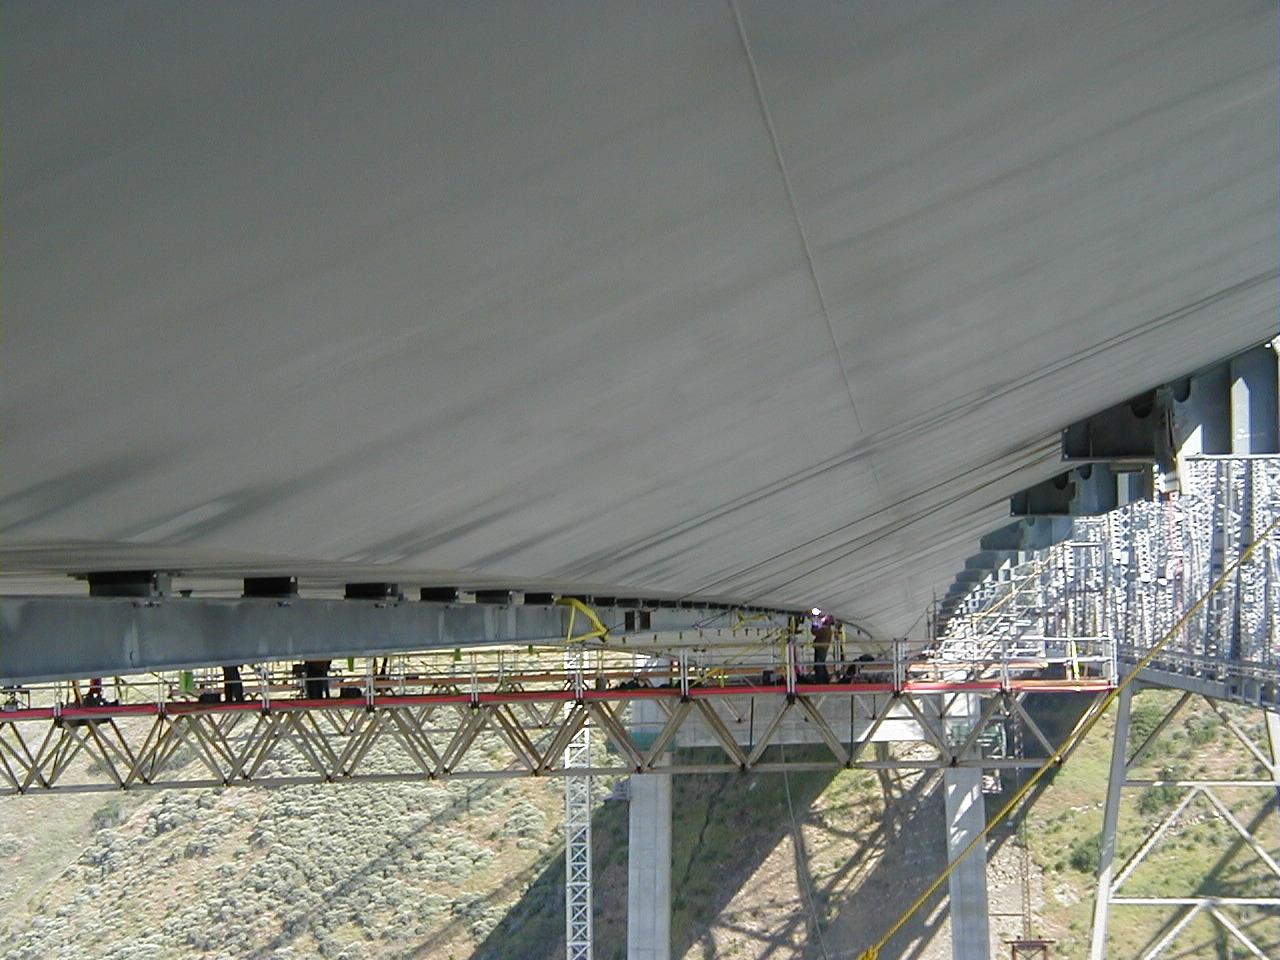 New Carquinez Bridge